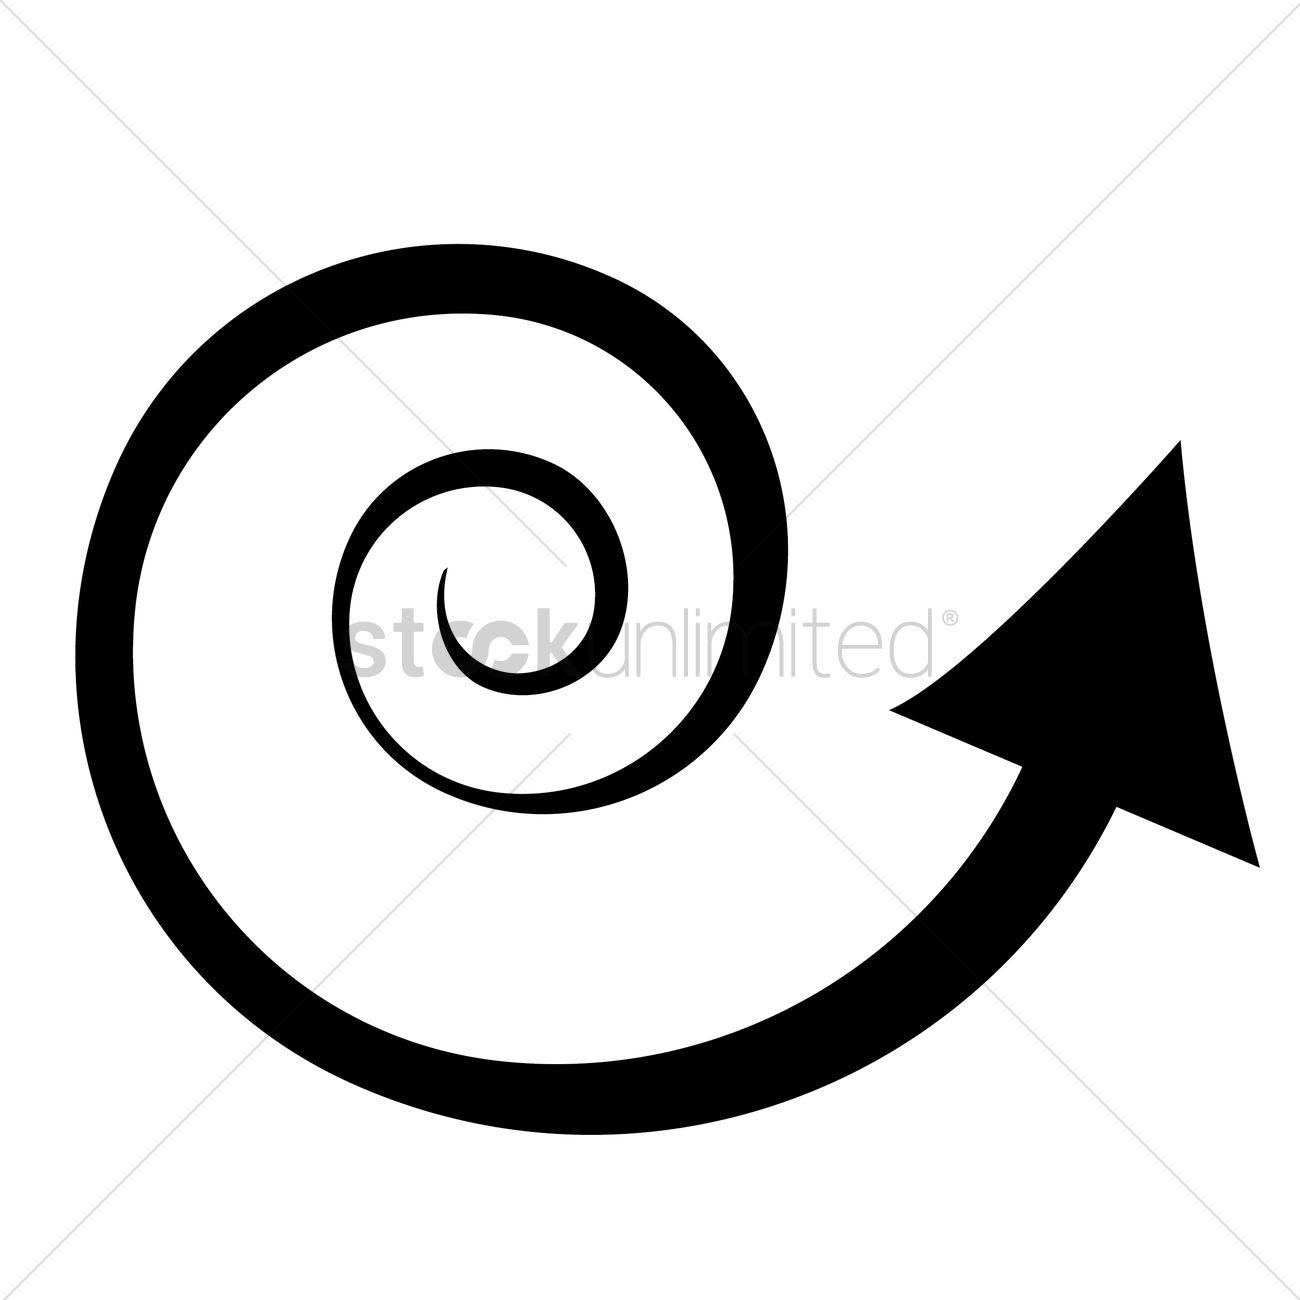 spiral arrow clipart - Clipground